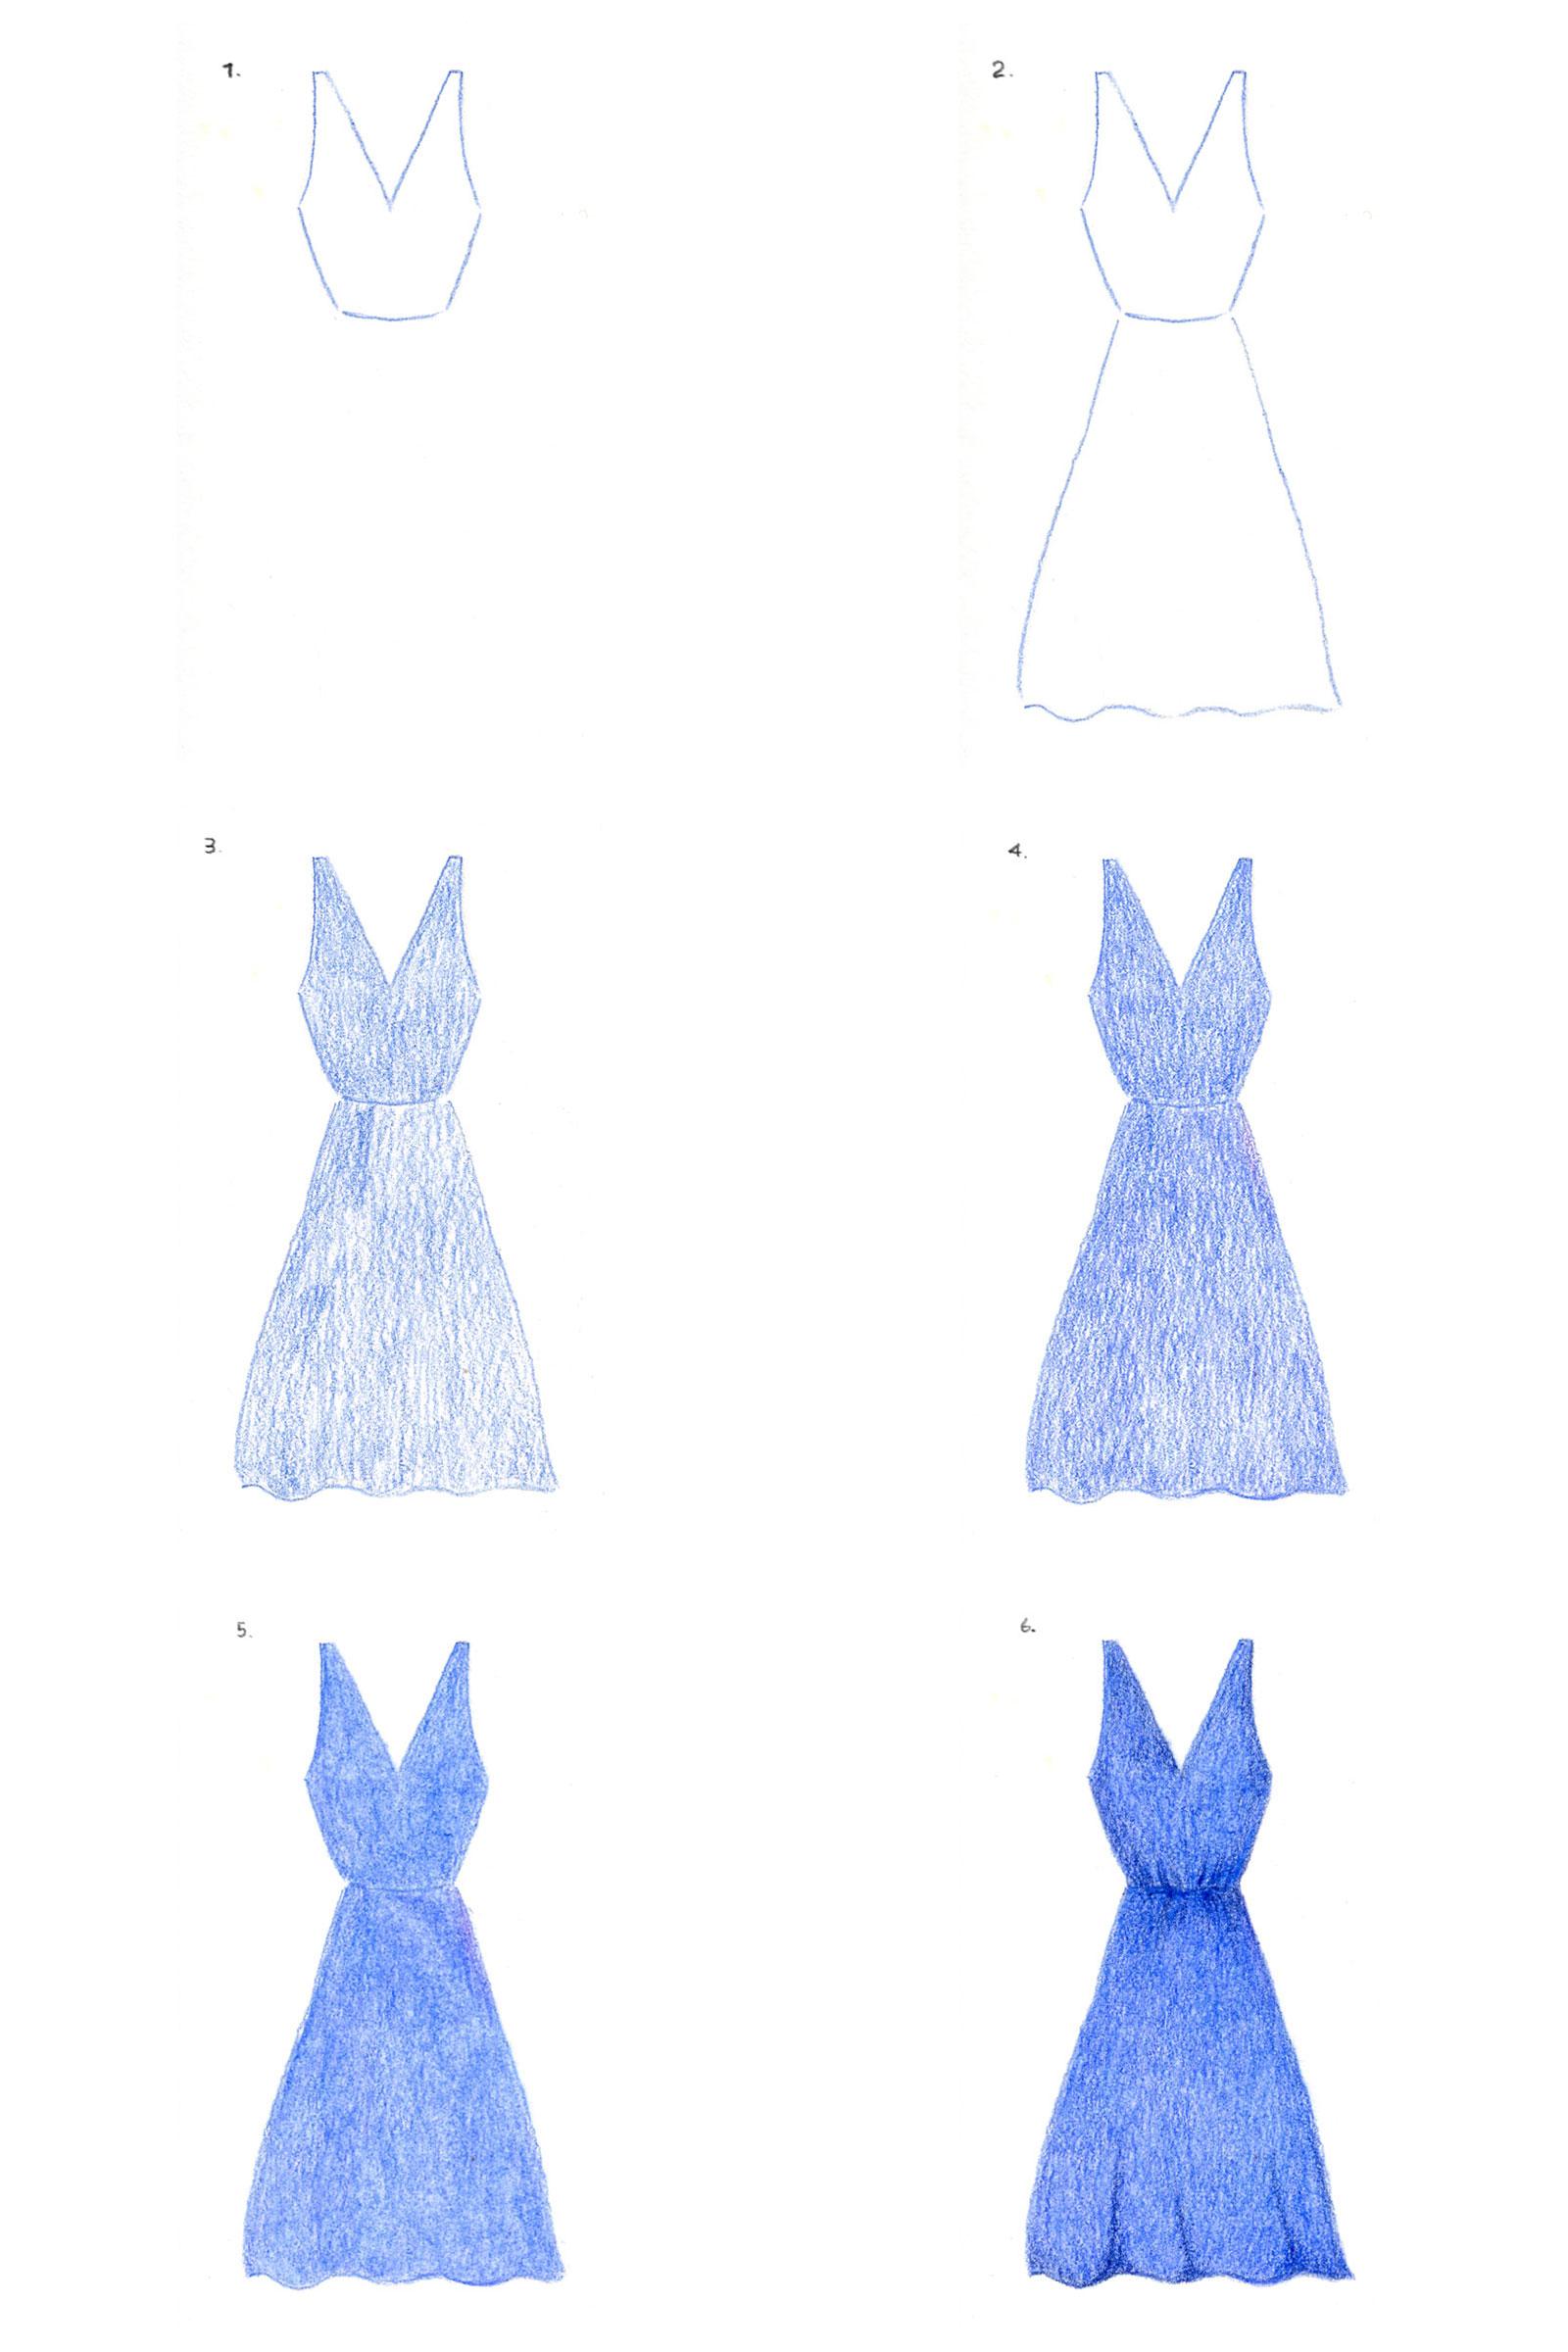 bluedress_steps.jpg